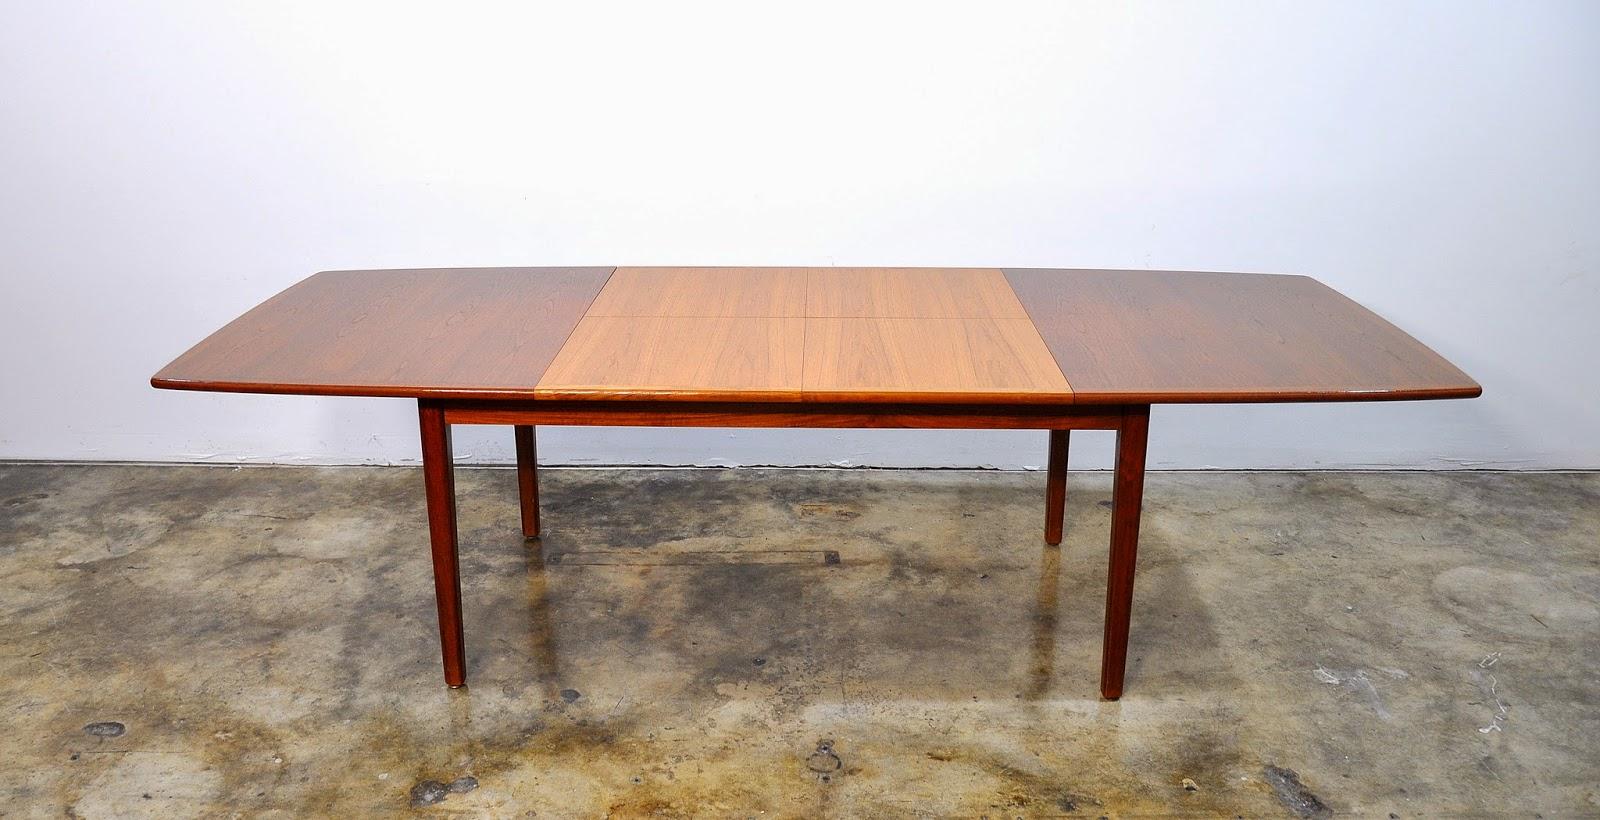 SELECT MODERN Falster Teak Expandable Dining Table : FalsterTeakDiningTable1 from midcenturymoderndesignfinds.blogspot.com size 1600 x 820 jpeg 263kB